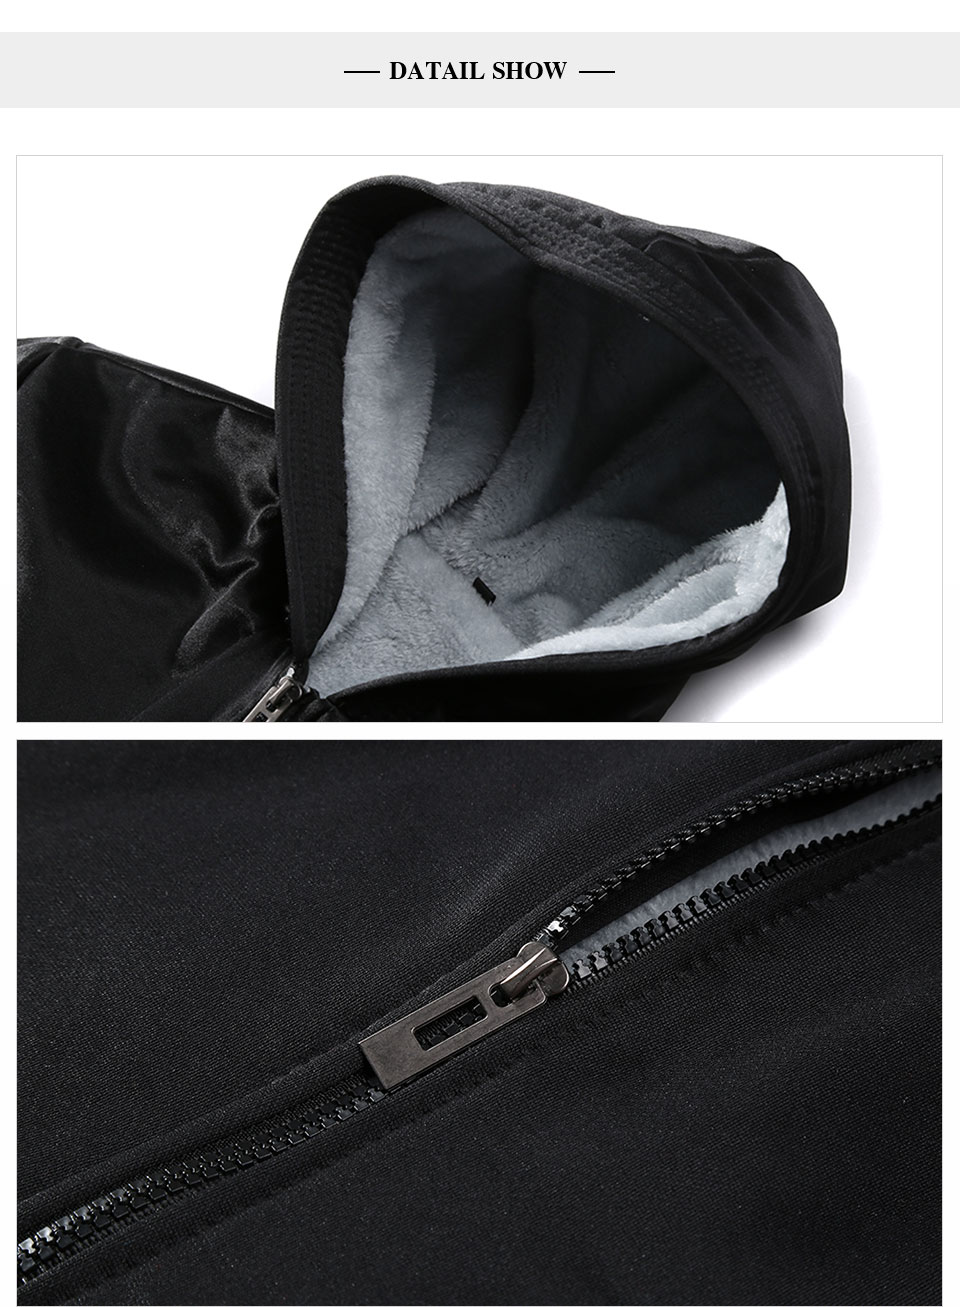 HTB1X3UTXEz1gK0jSZLeq6z9kVXag LBL Winter Mens Fleece Jacket Thick Solid Bomber Jackets Men Slim Fit Hooded Coat Man Autumn Warm Tracksuit New Men's Sportswear